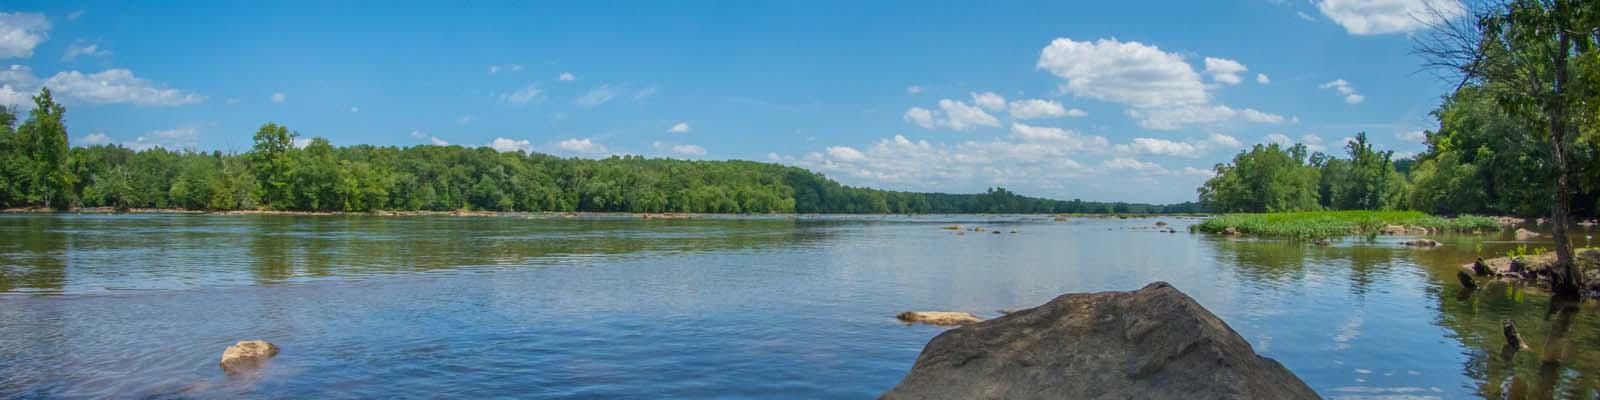 Pictured: A lake in South Carolina.